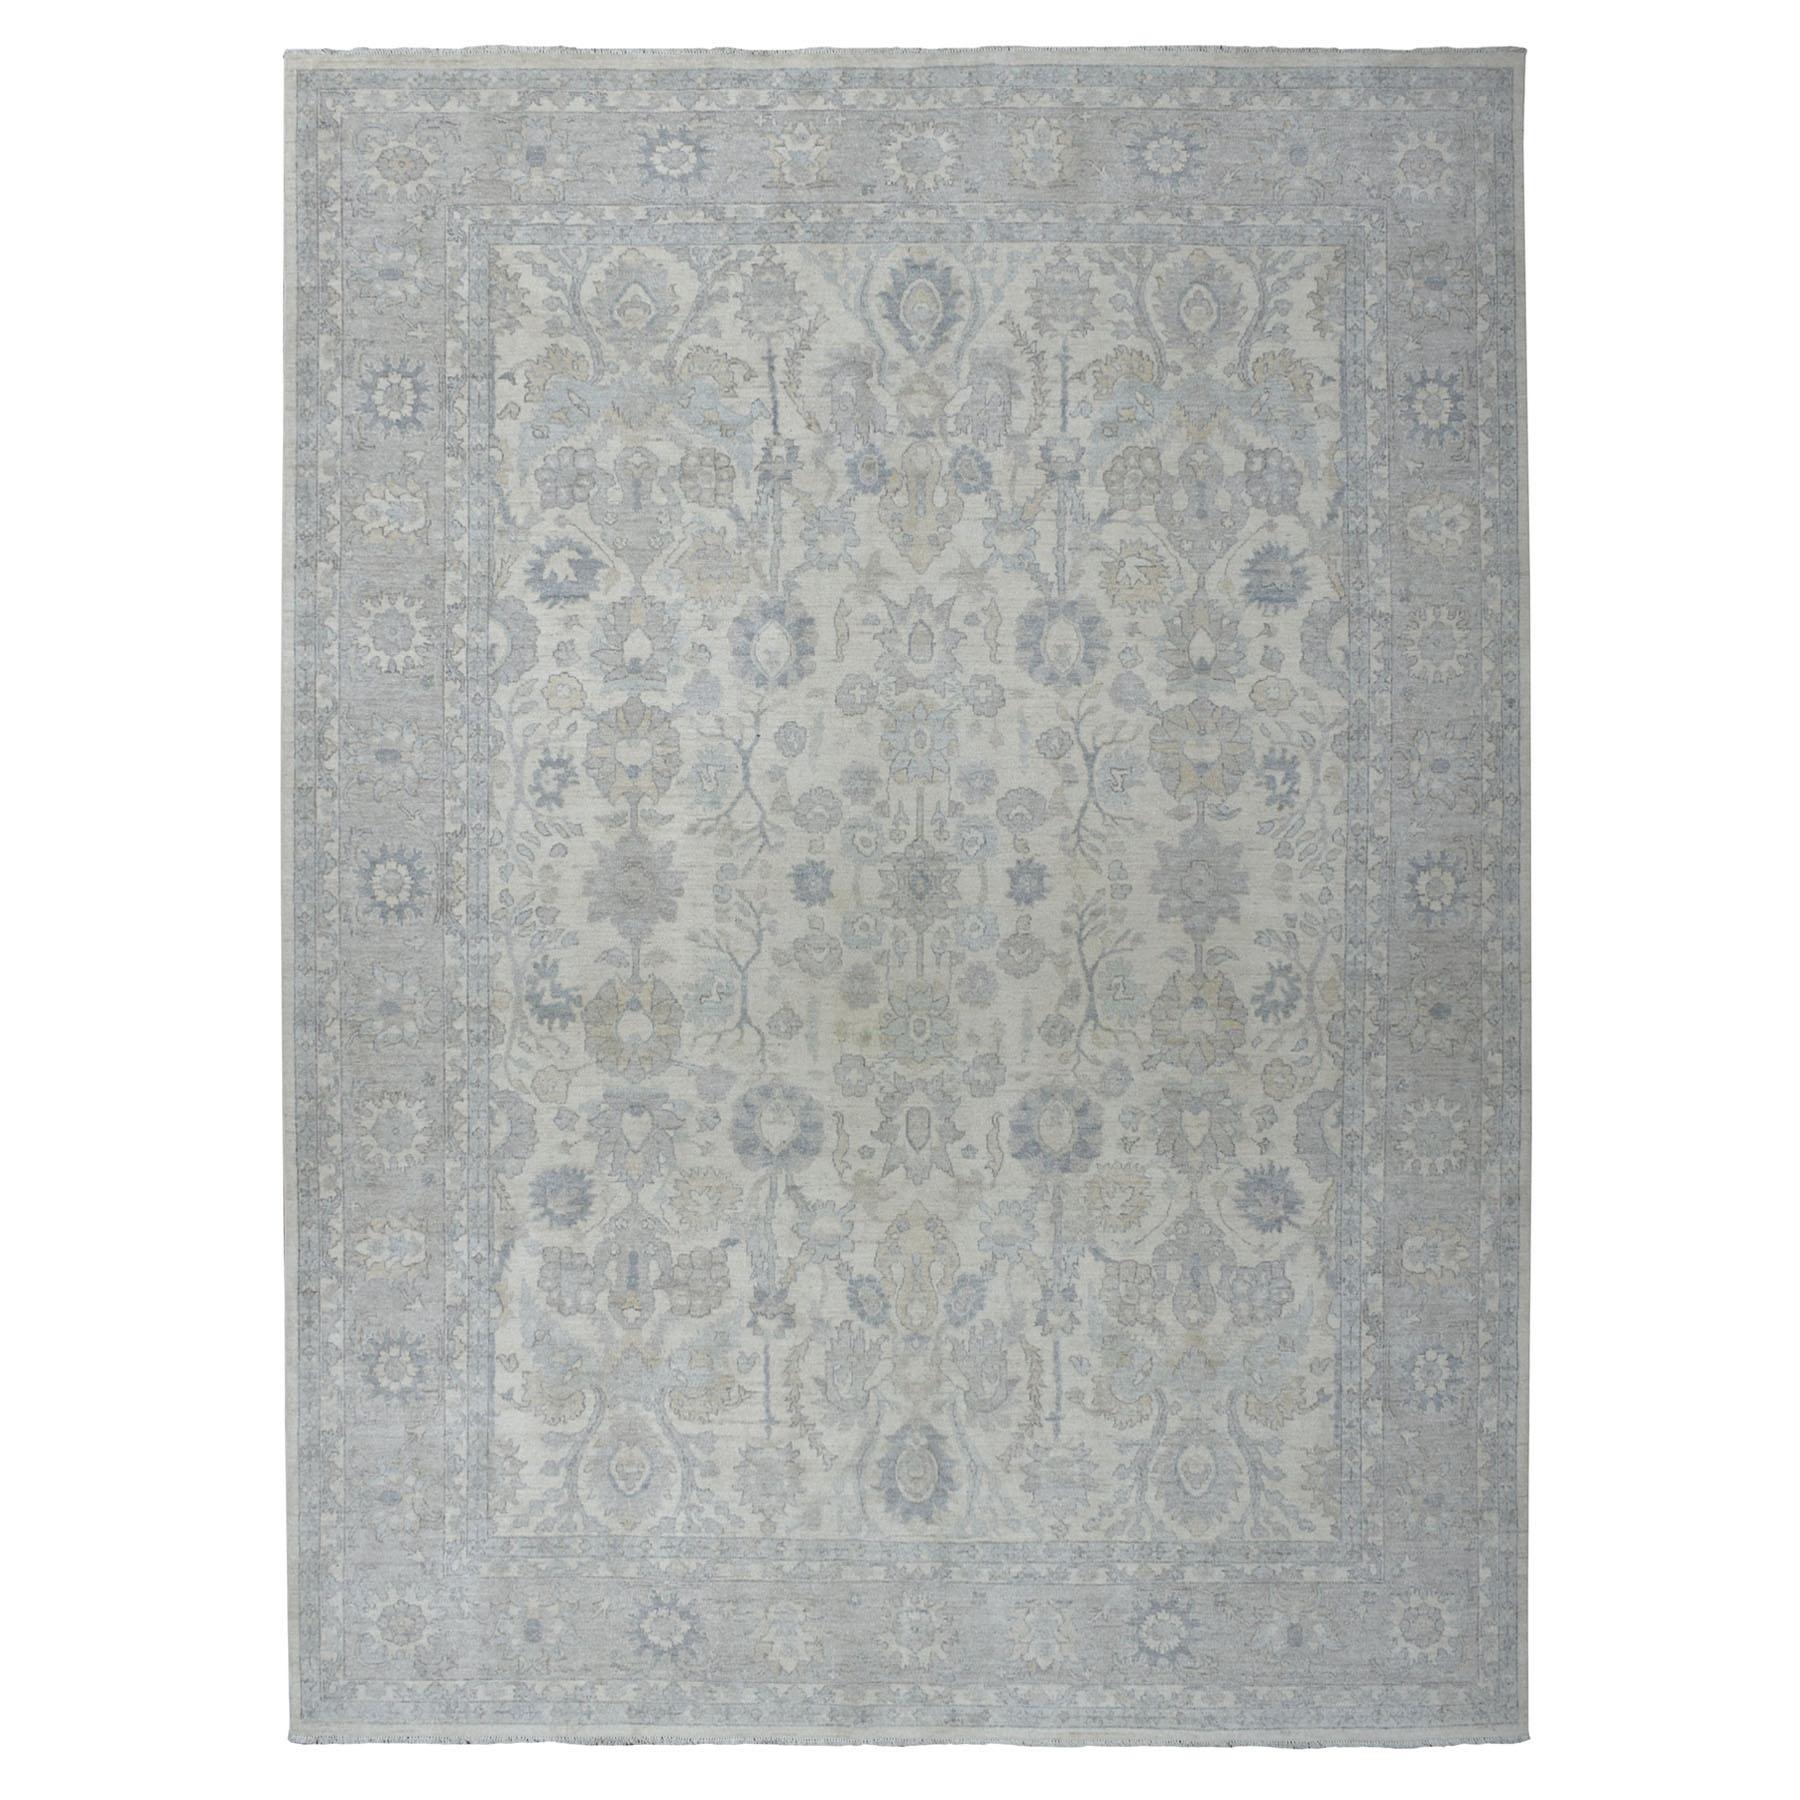 "9'1""X11'9"" White Wash Peshawar Pure Wool Hand-Knotted Oriental Rug moaeadb0"